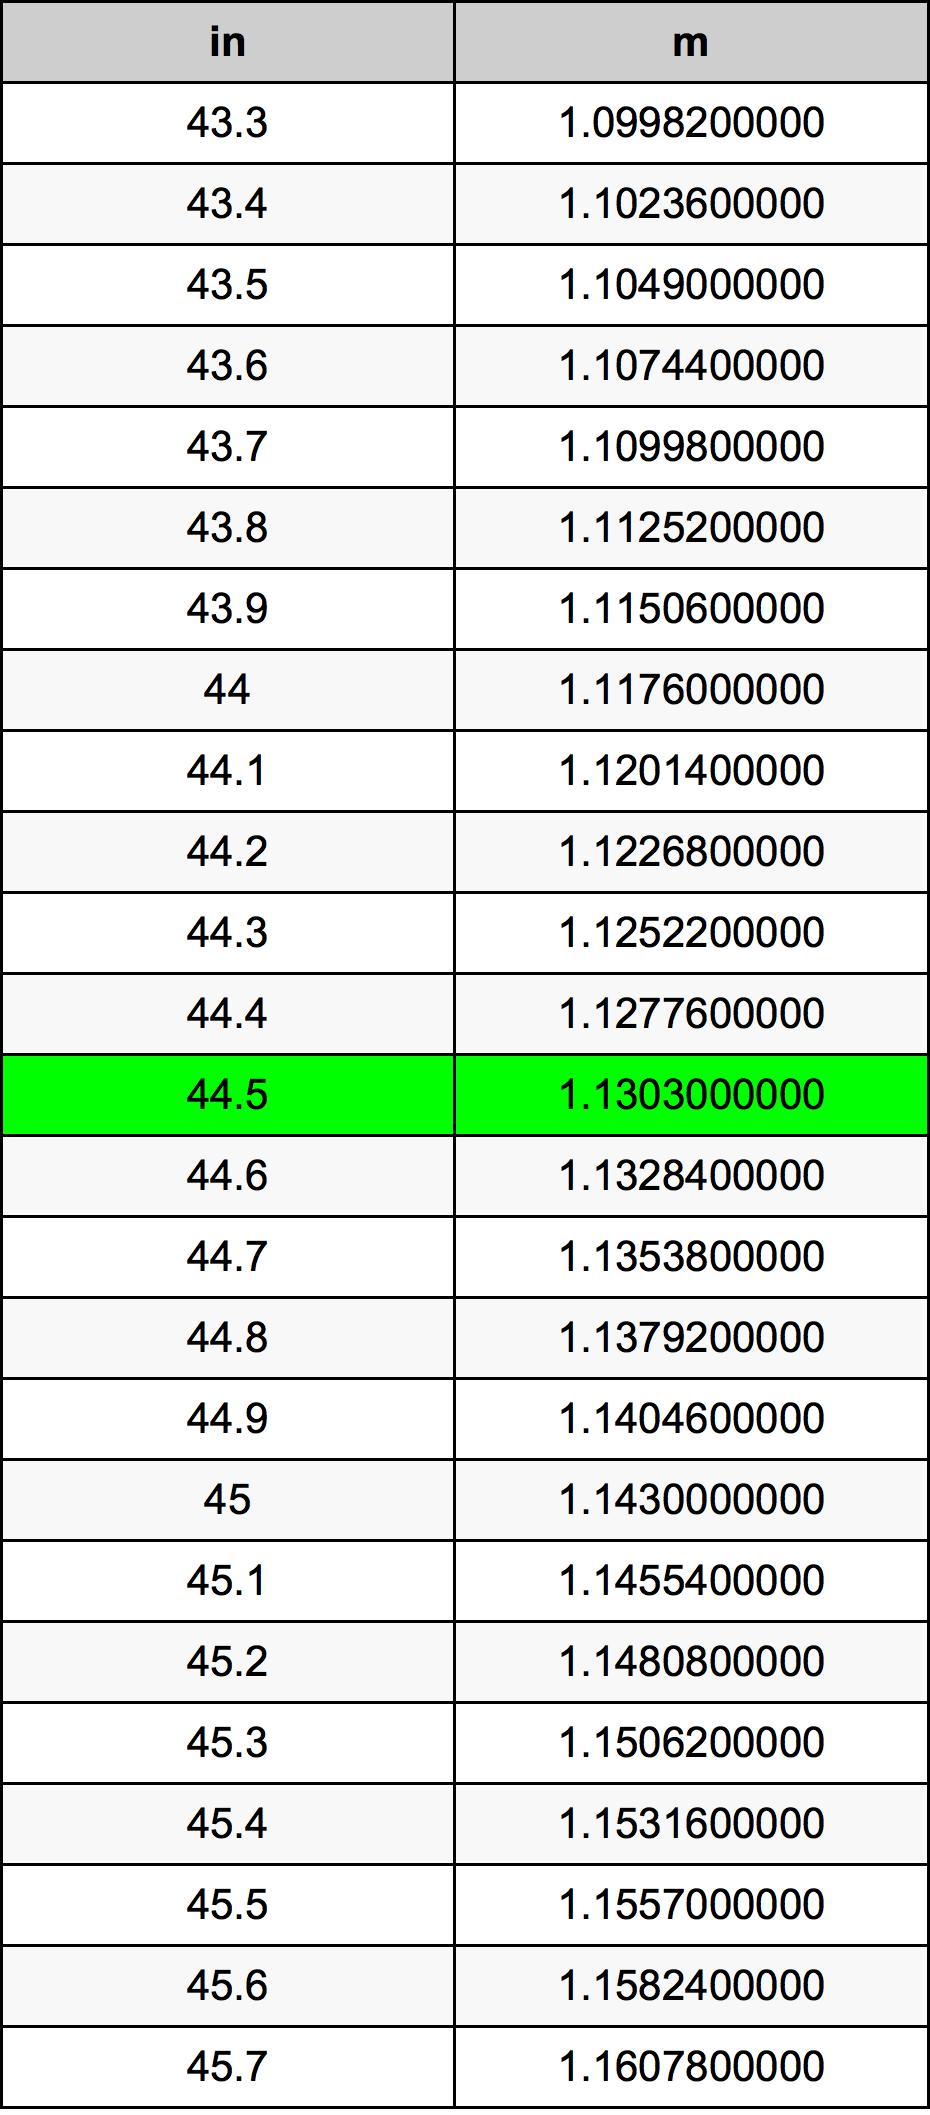 44.5 дюйм Таблица преобразования